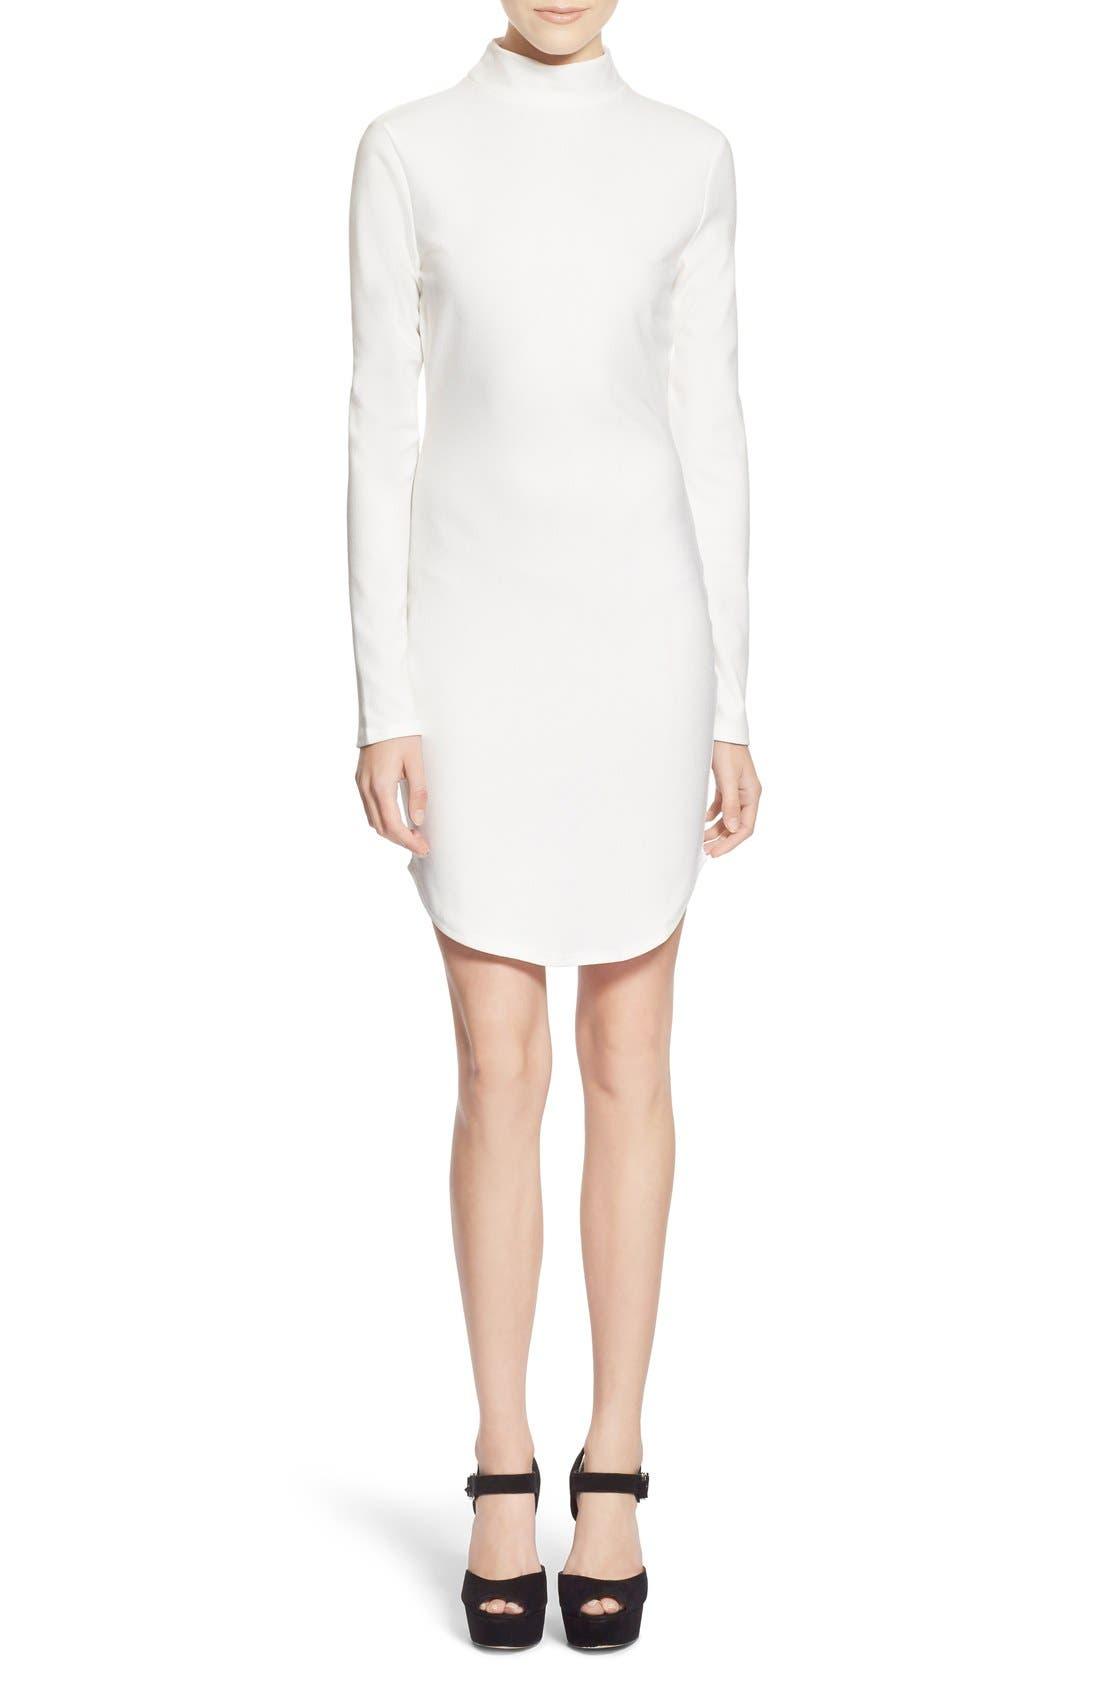 Alternate Image 1 Selected - MissguidedMock NeckSheath Dress